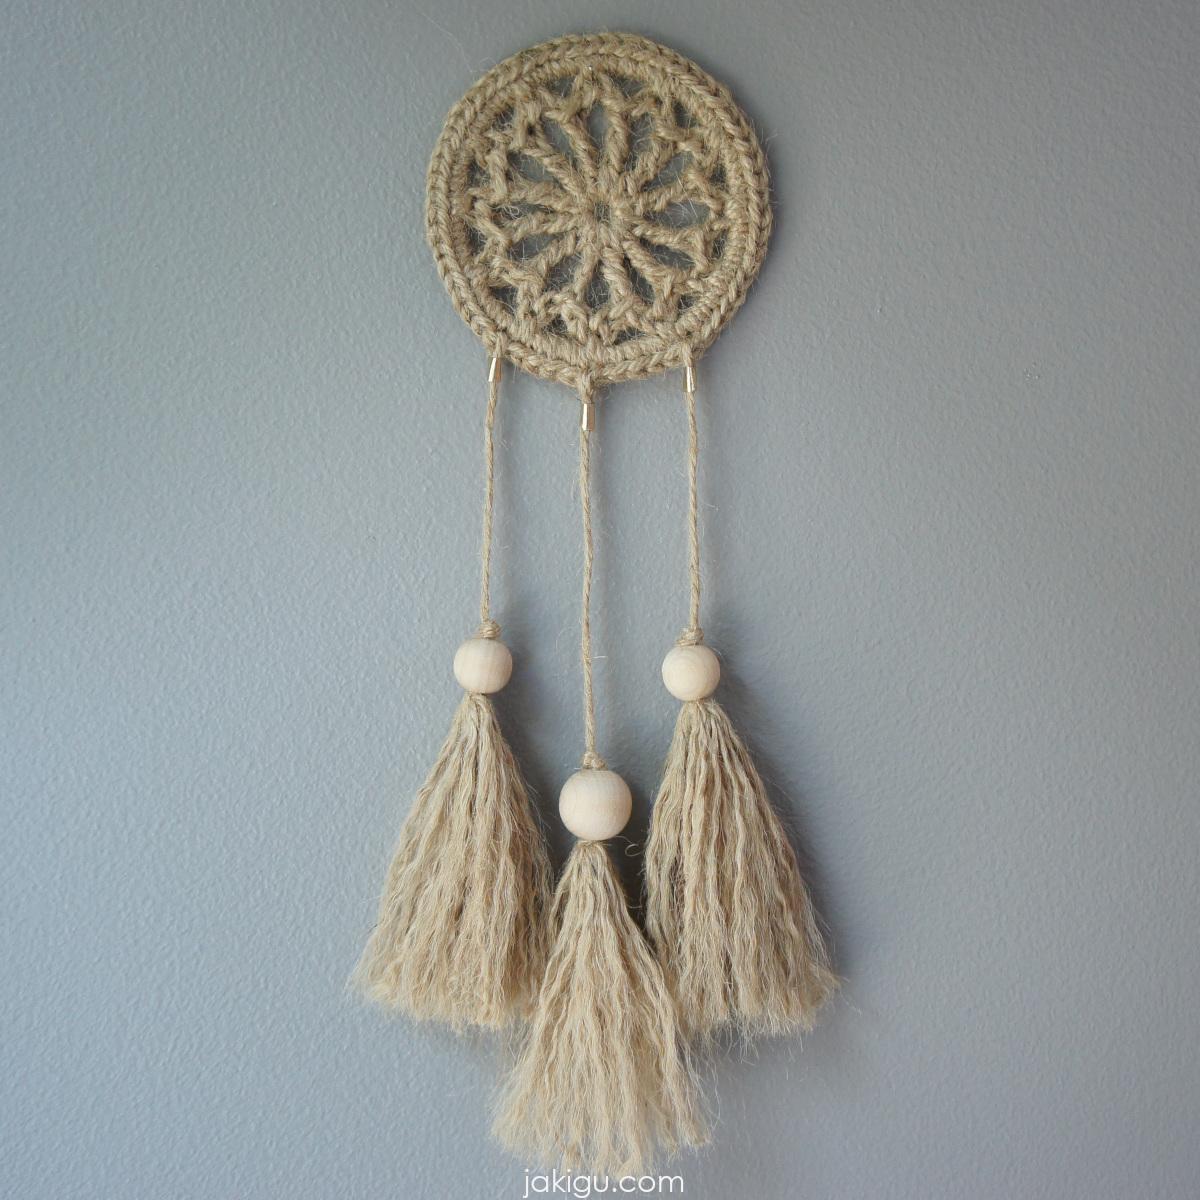 Jute Dream Catcher | | jakigu.com crochet pattern